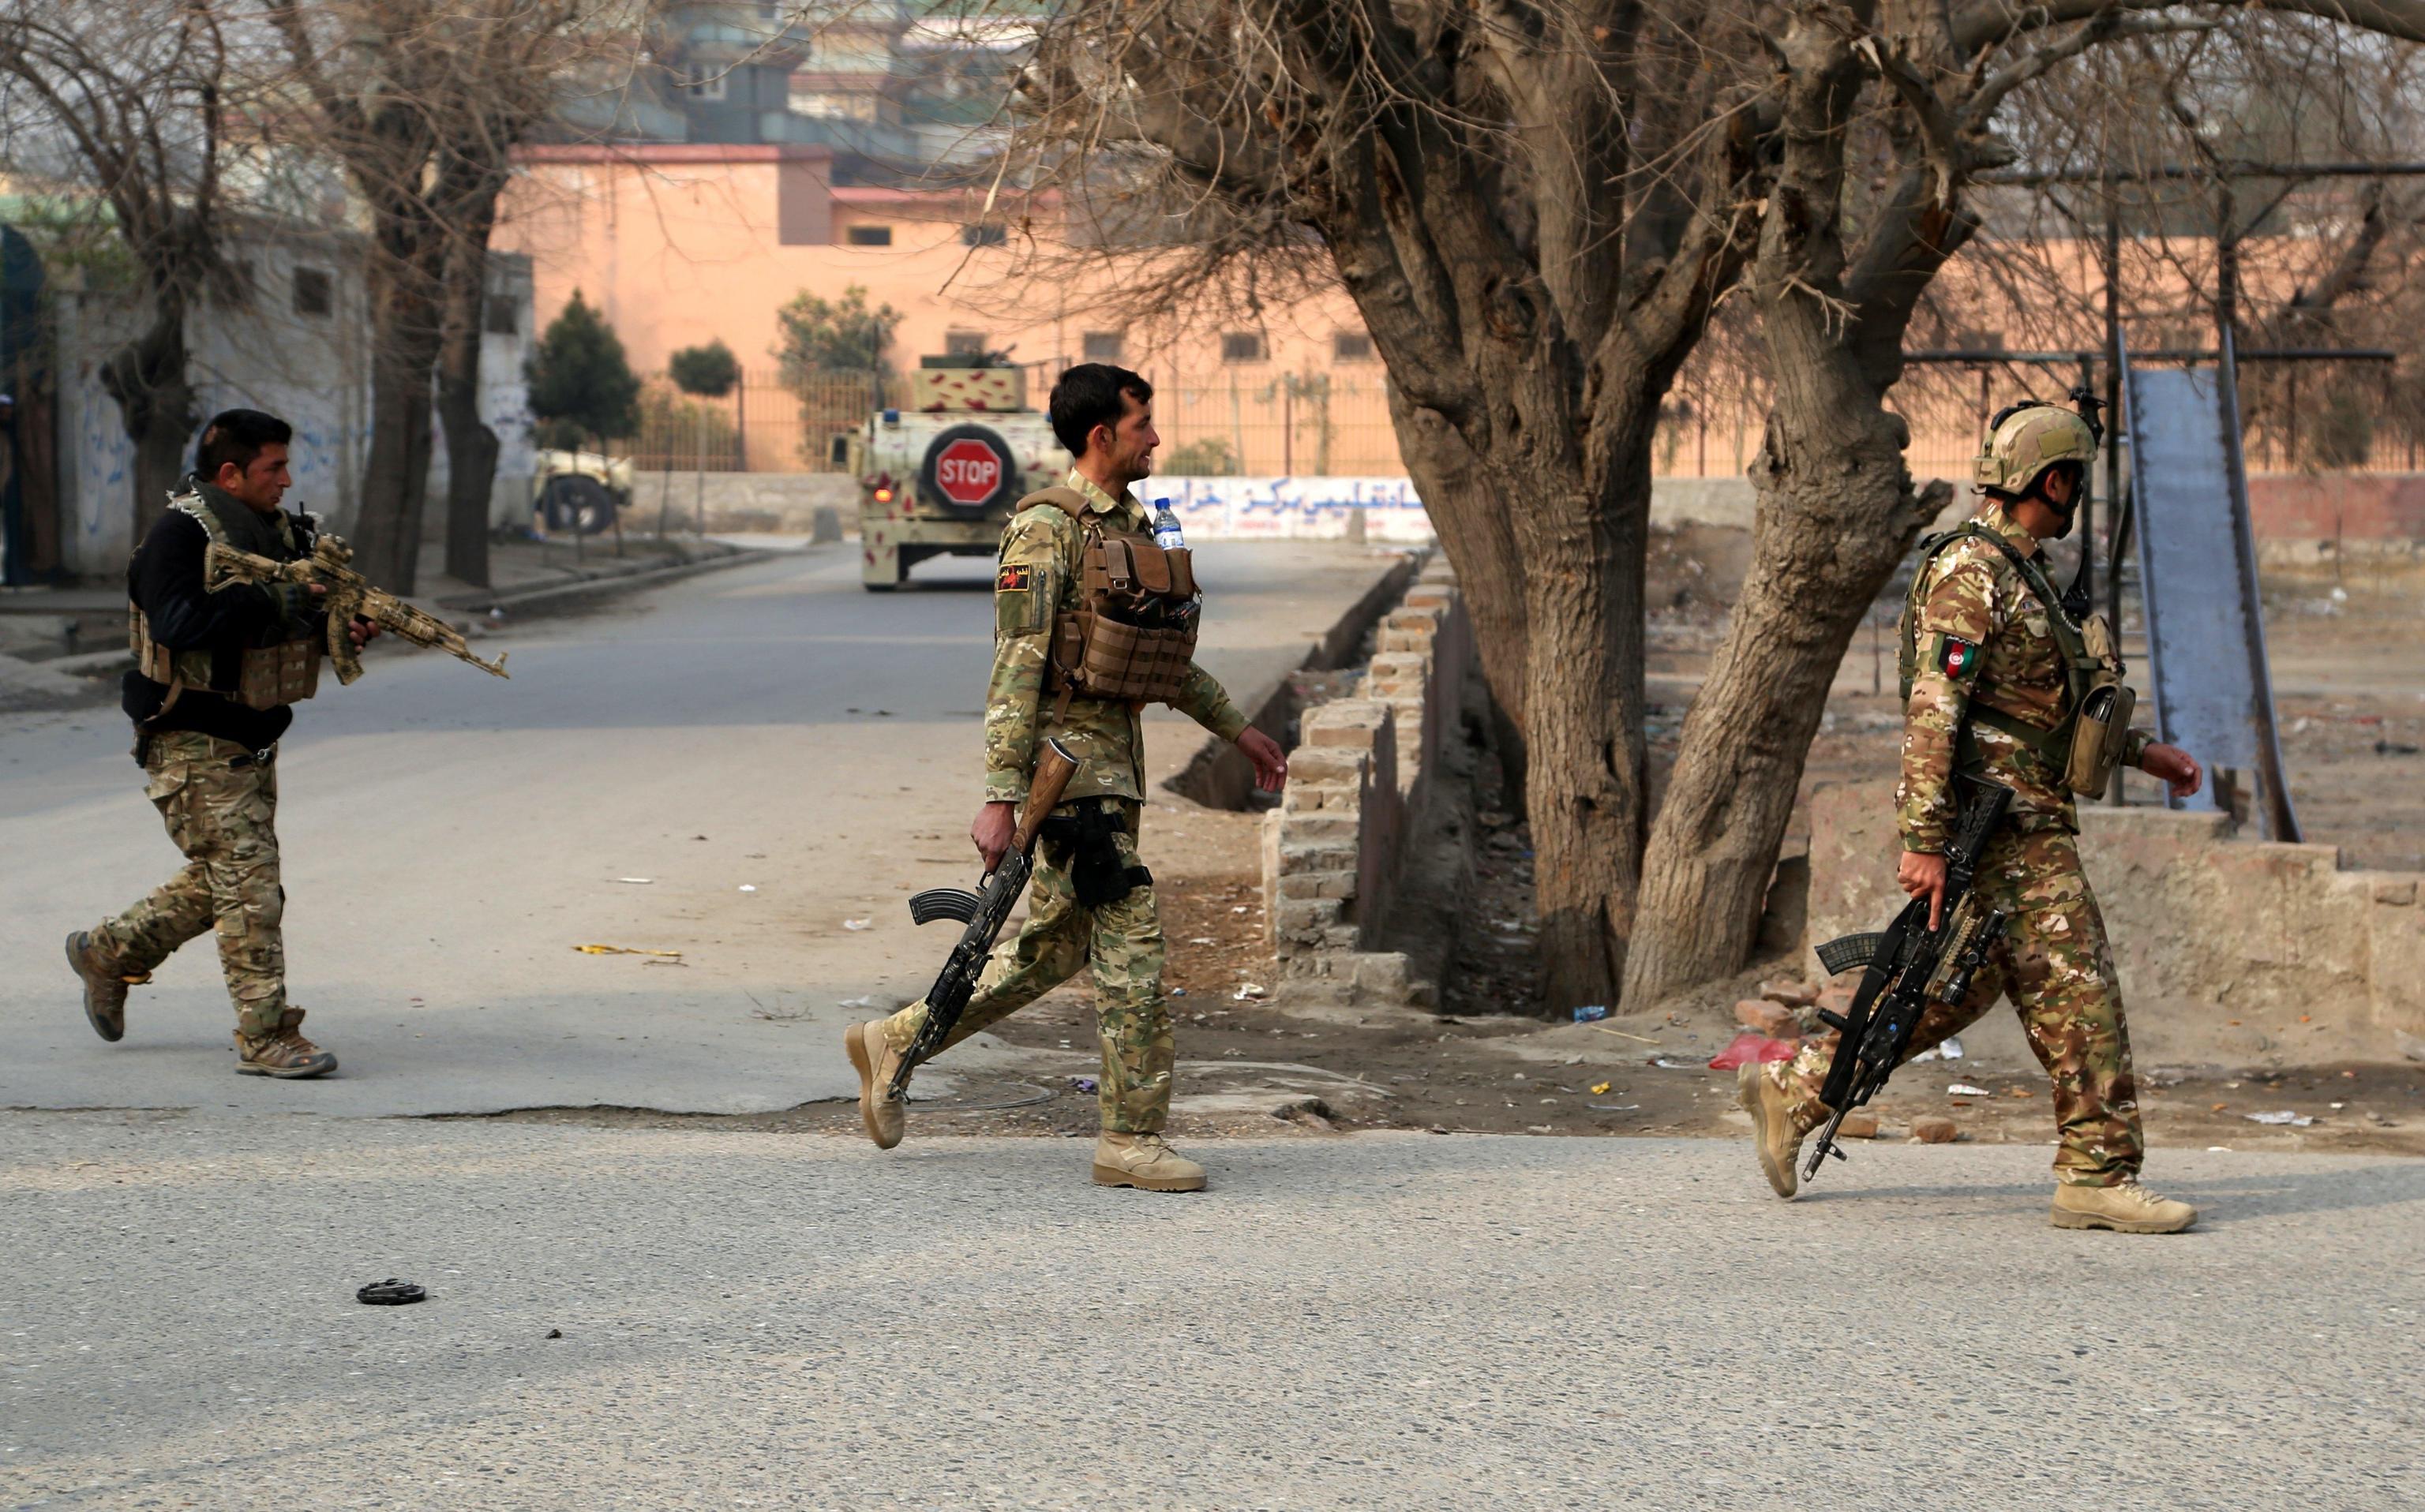 Save the Children, attacco suicida contro la sede dell'Ong in Afghanistan: l'Isis rivendica